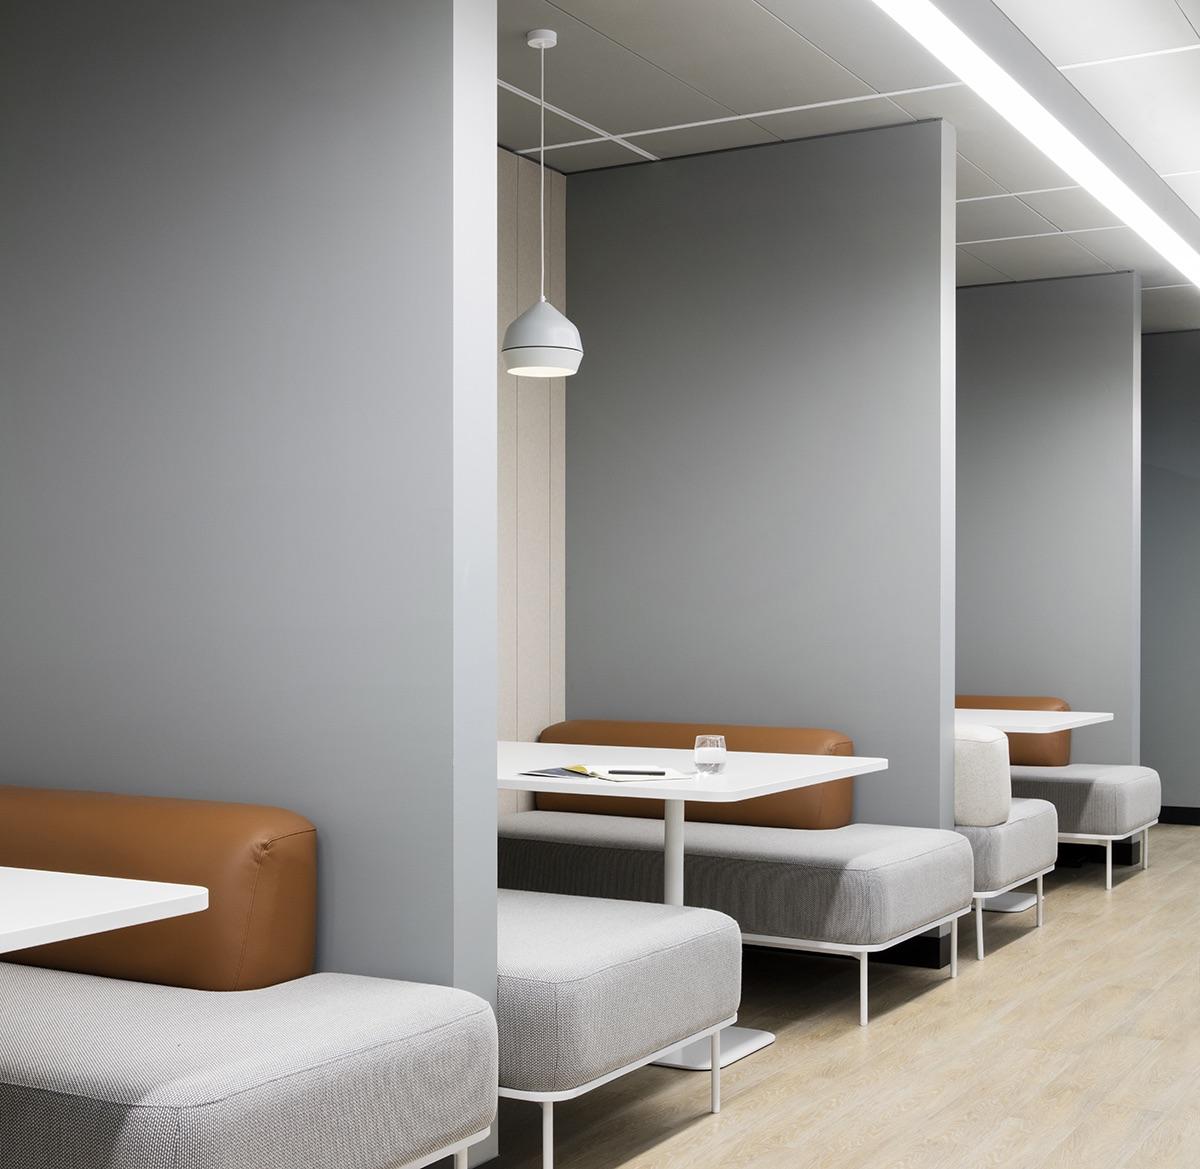 kordamentha-office-melbourne-9